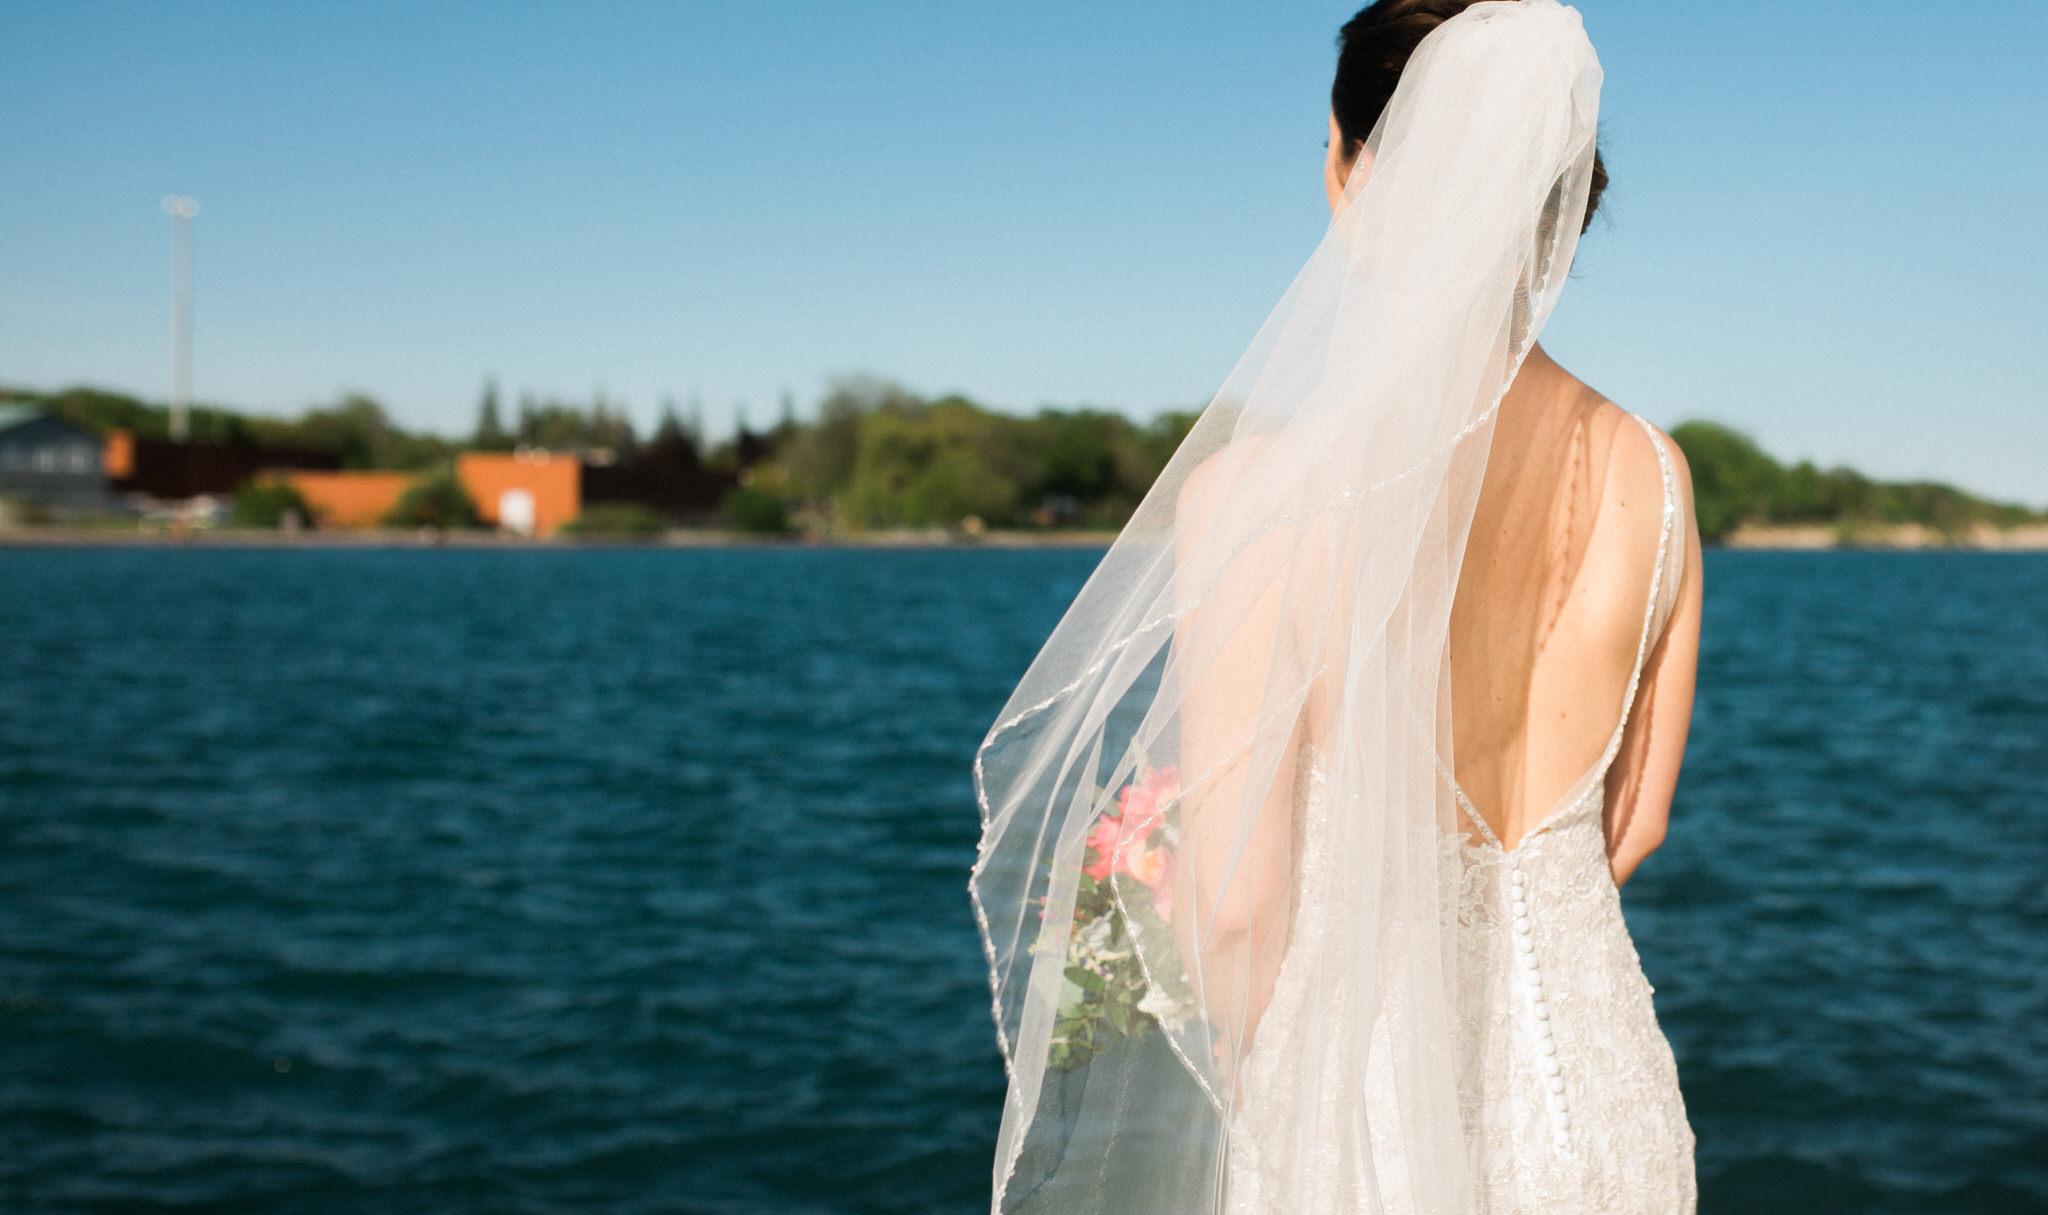 Brock Street Brewery Wedding - bride with veil at the beach